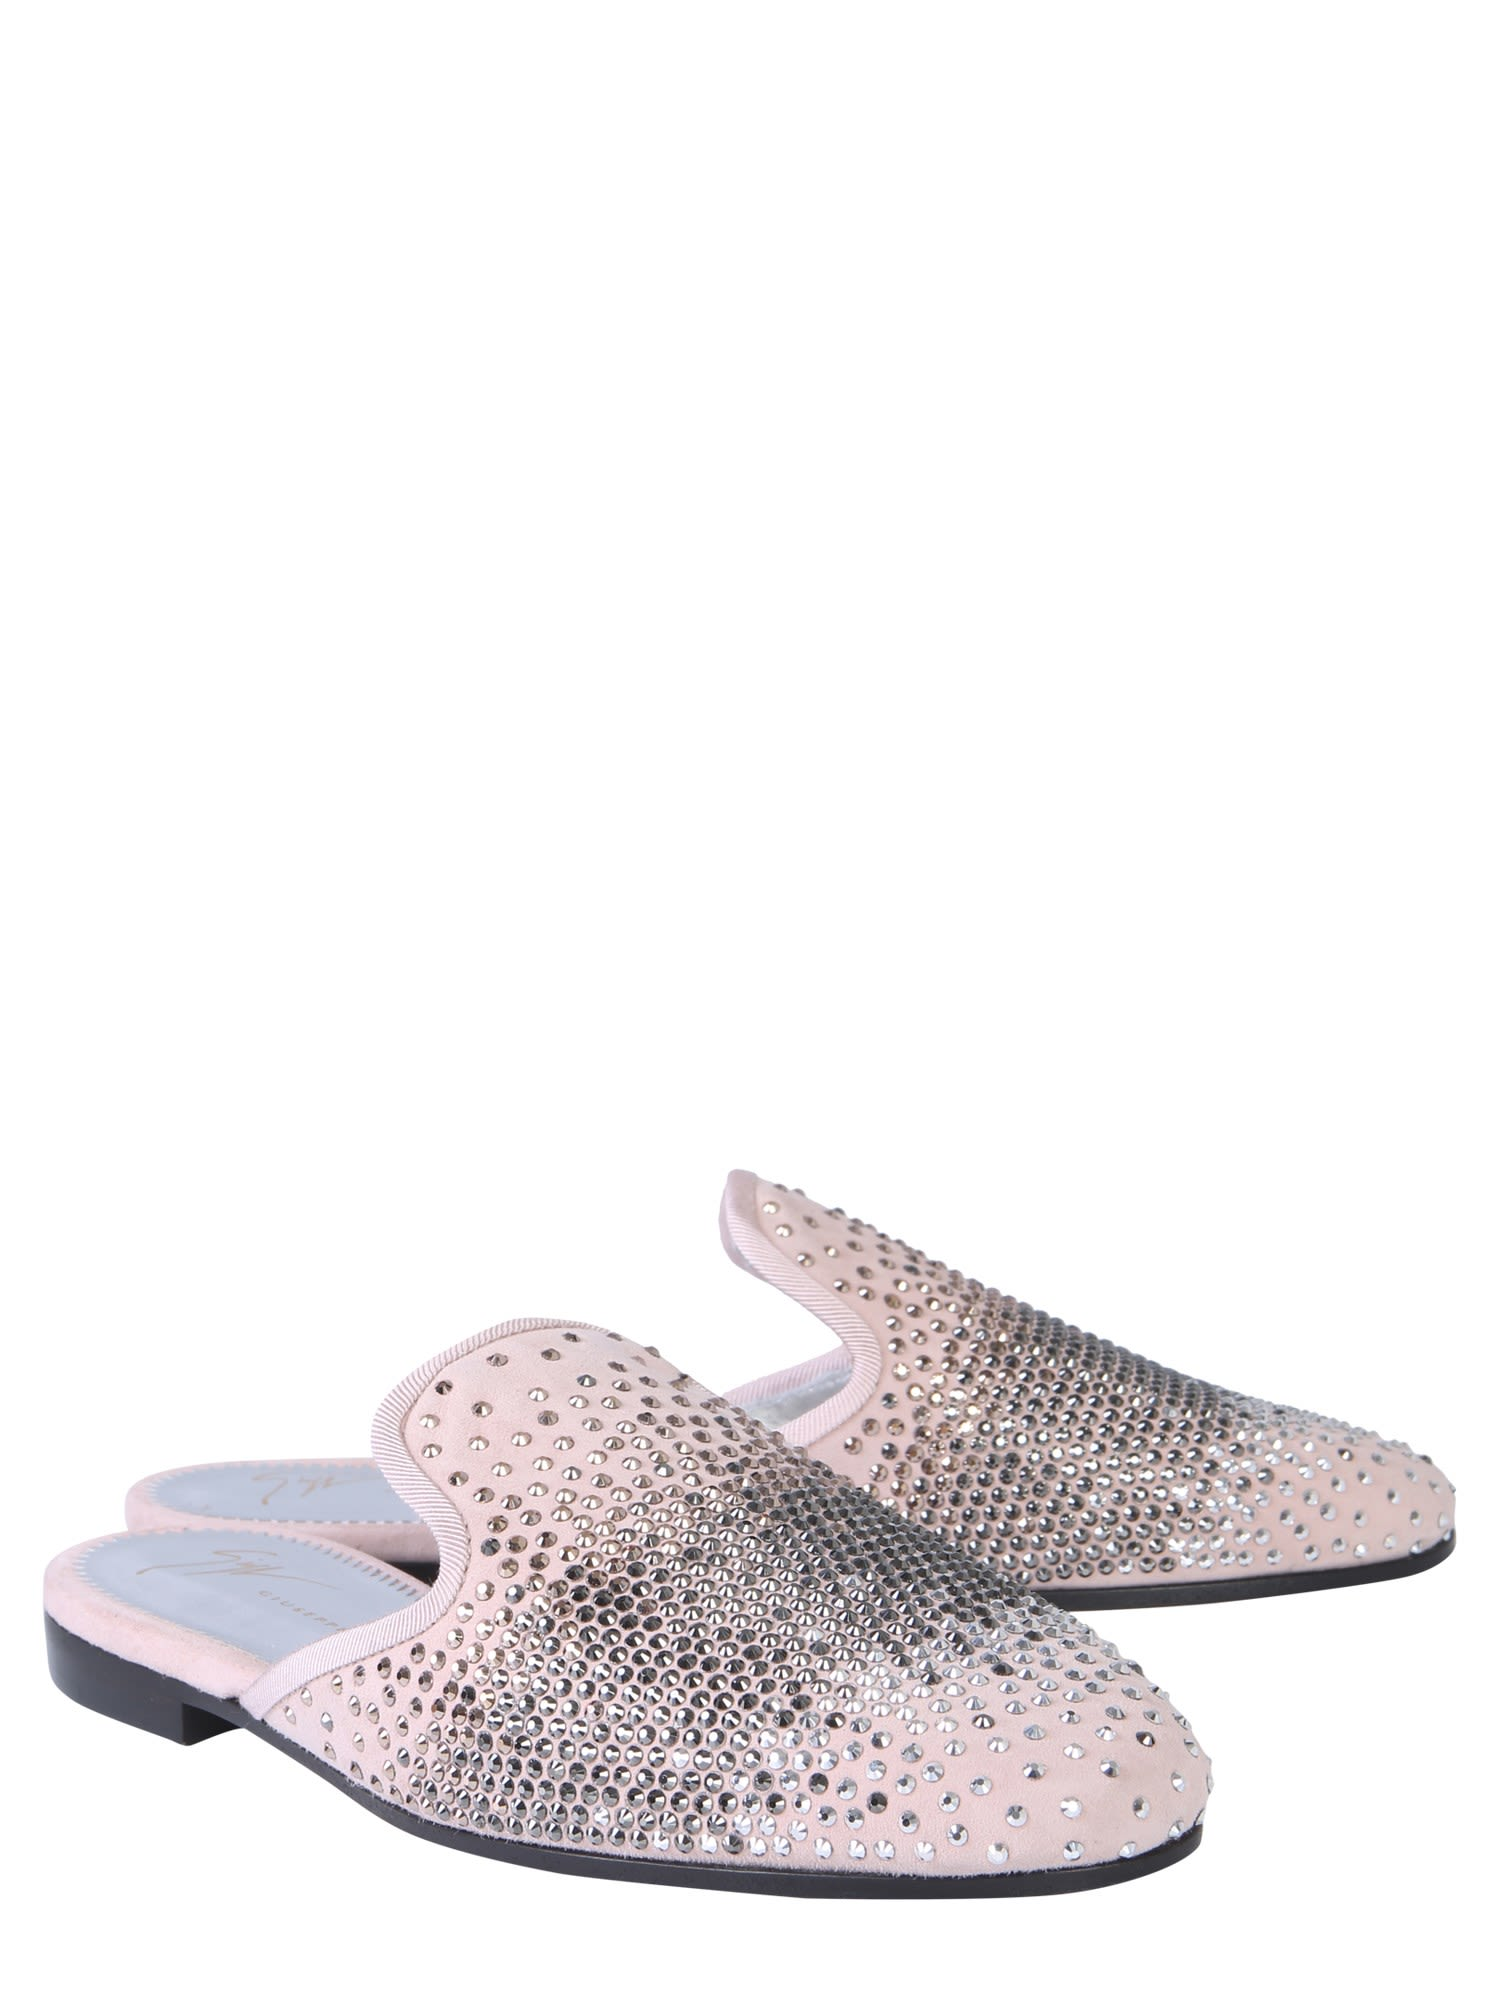 Giuseppe Zanotti Shoes Giuseppe Zanotti Letizia Mules